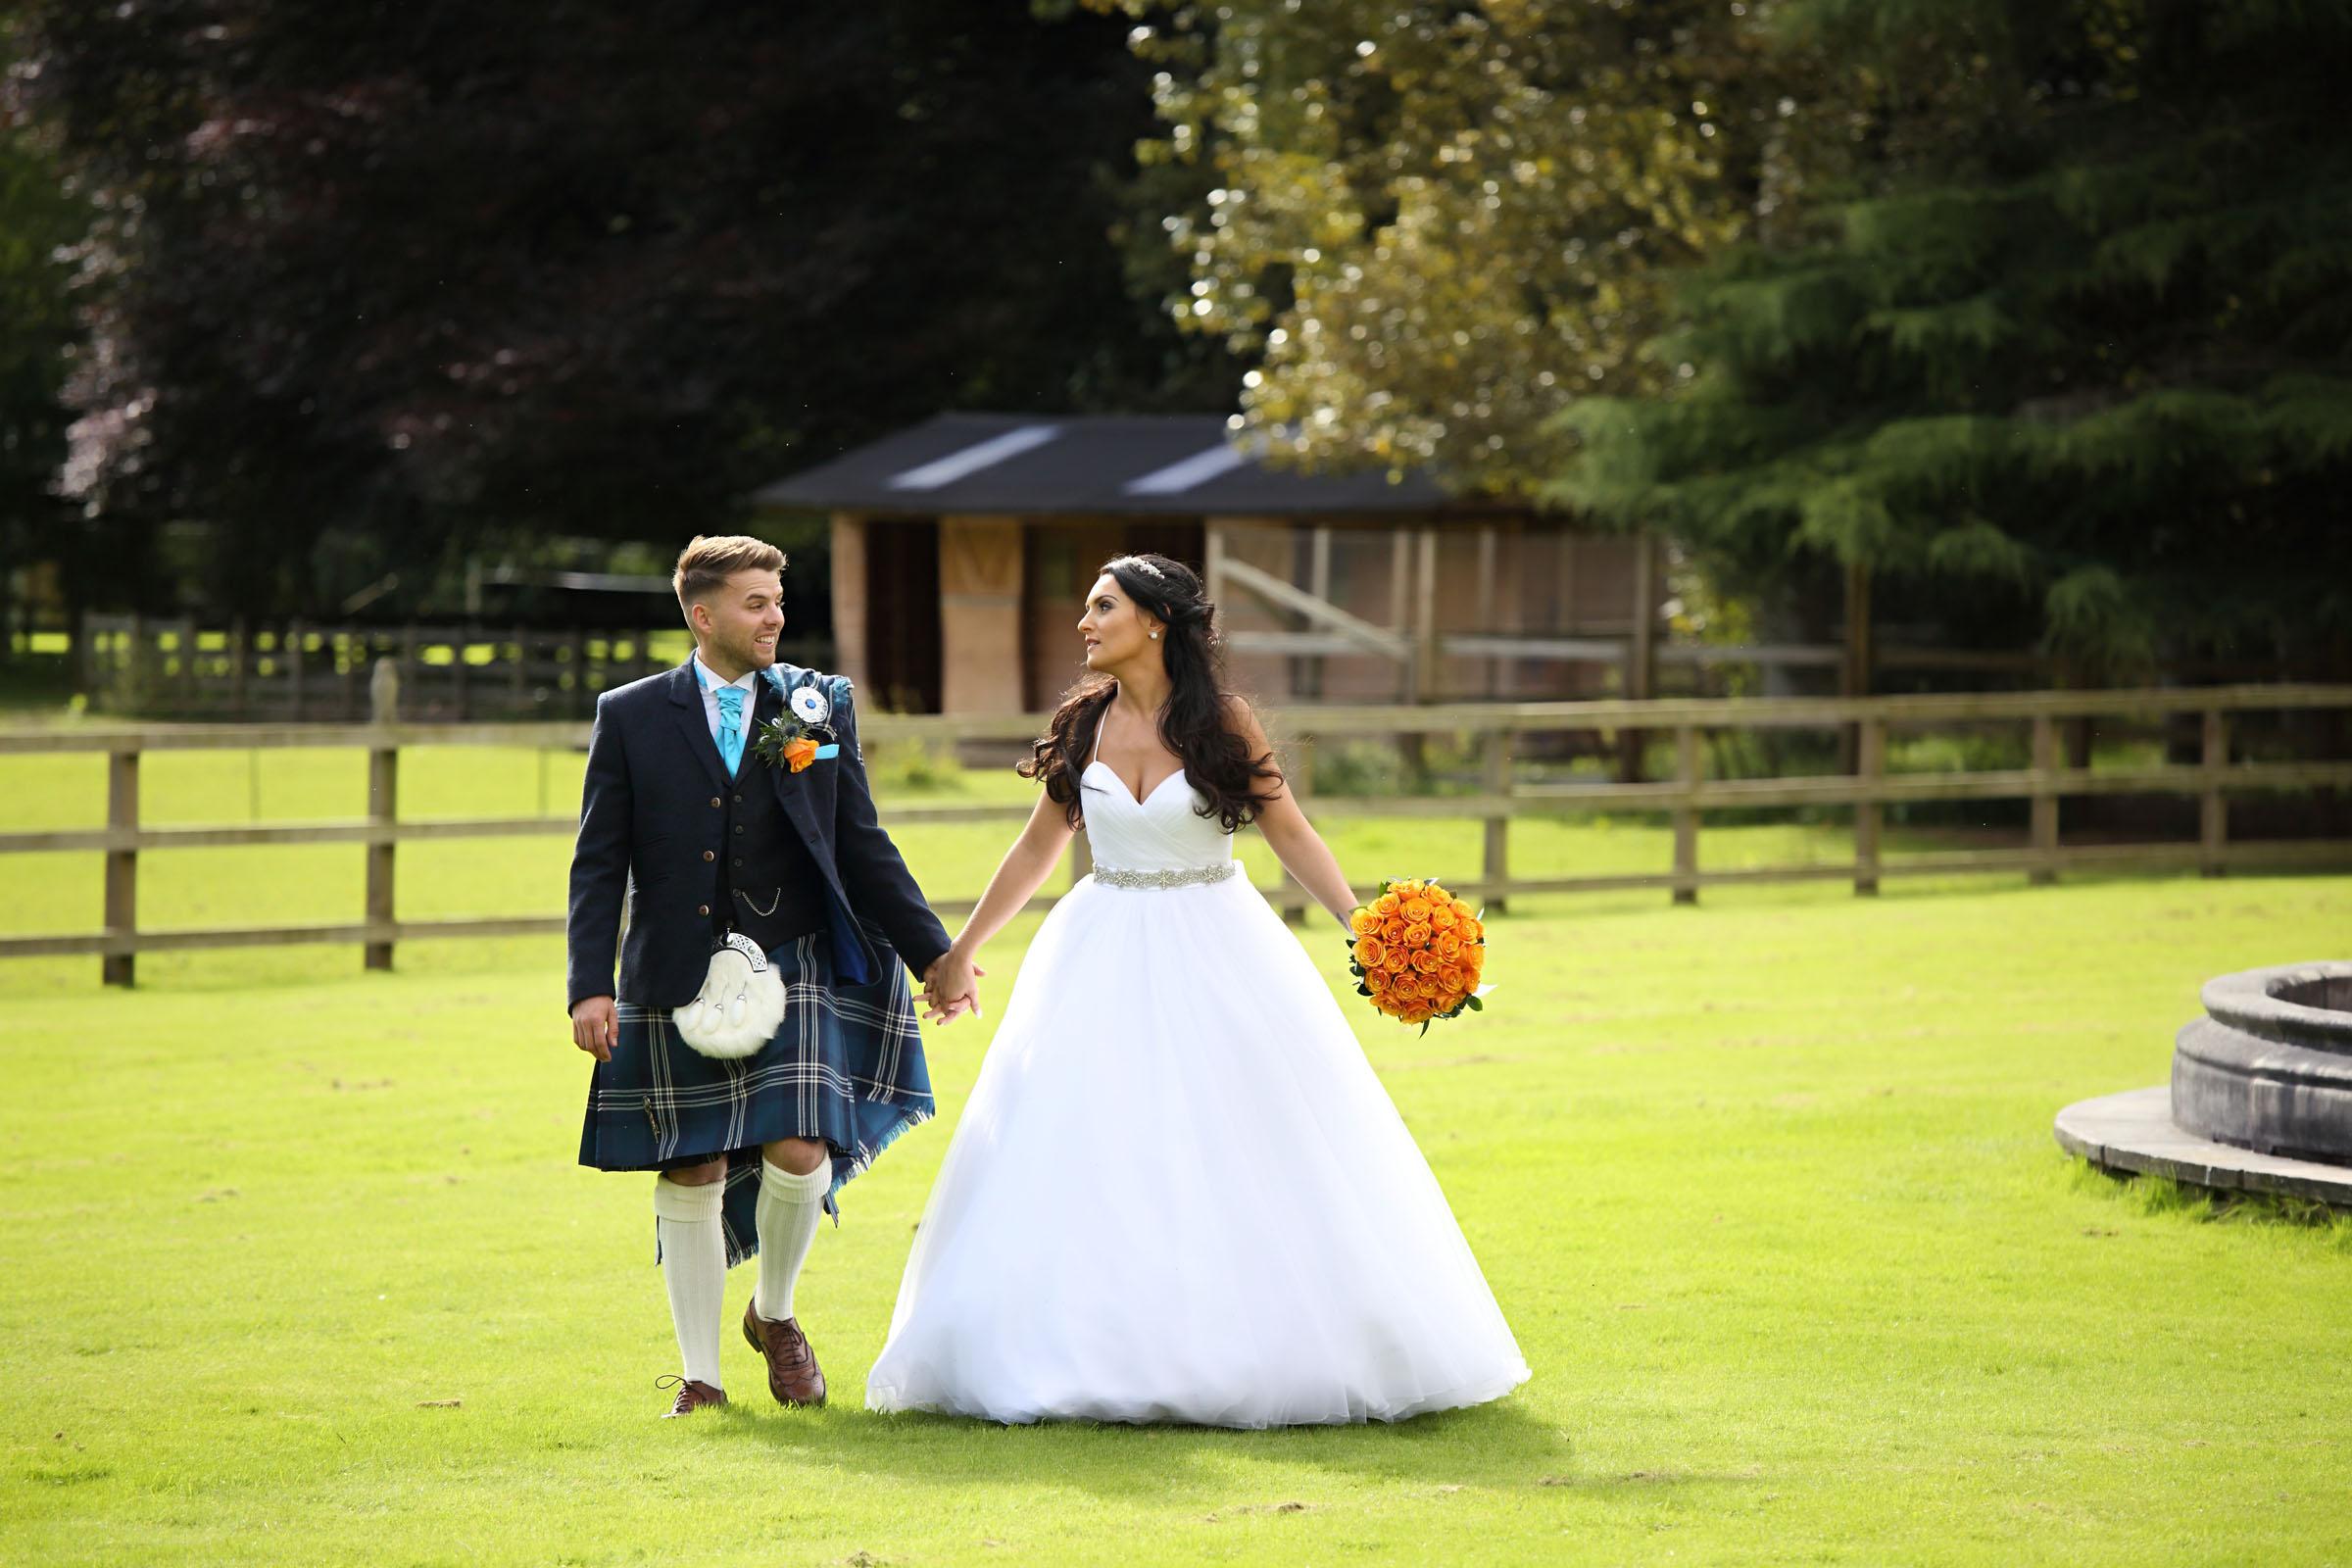 Bride_and_Groom_walk_wedding photographer.jpg